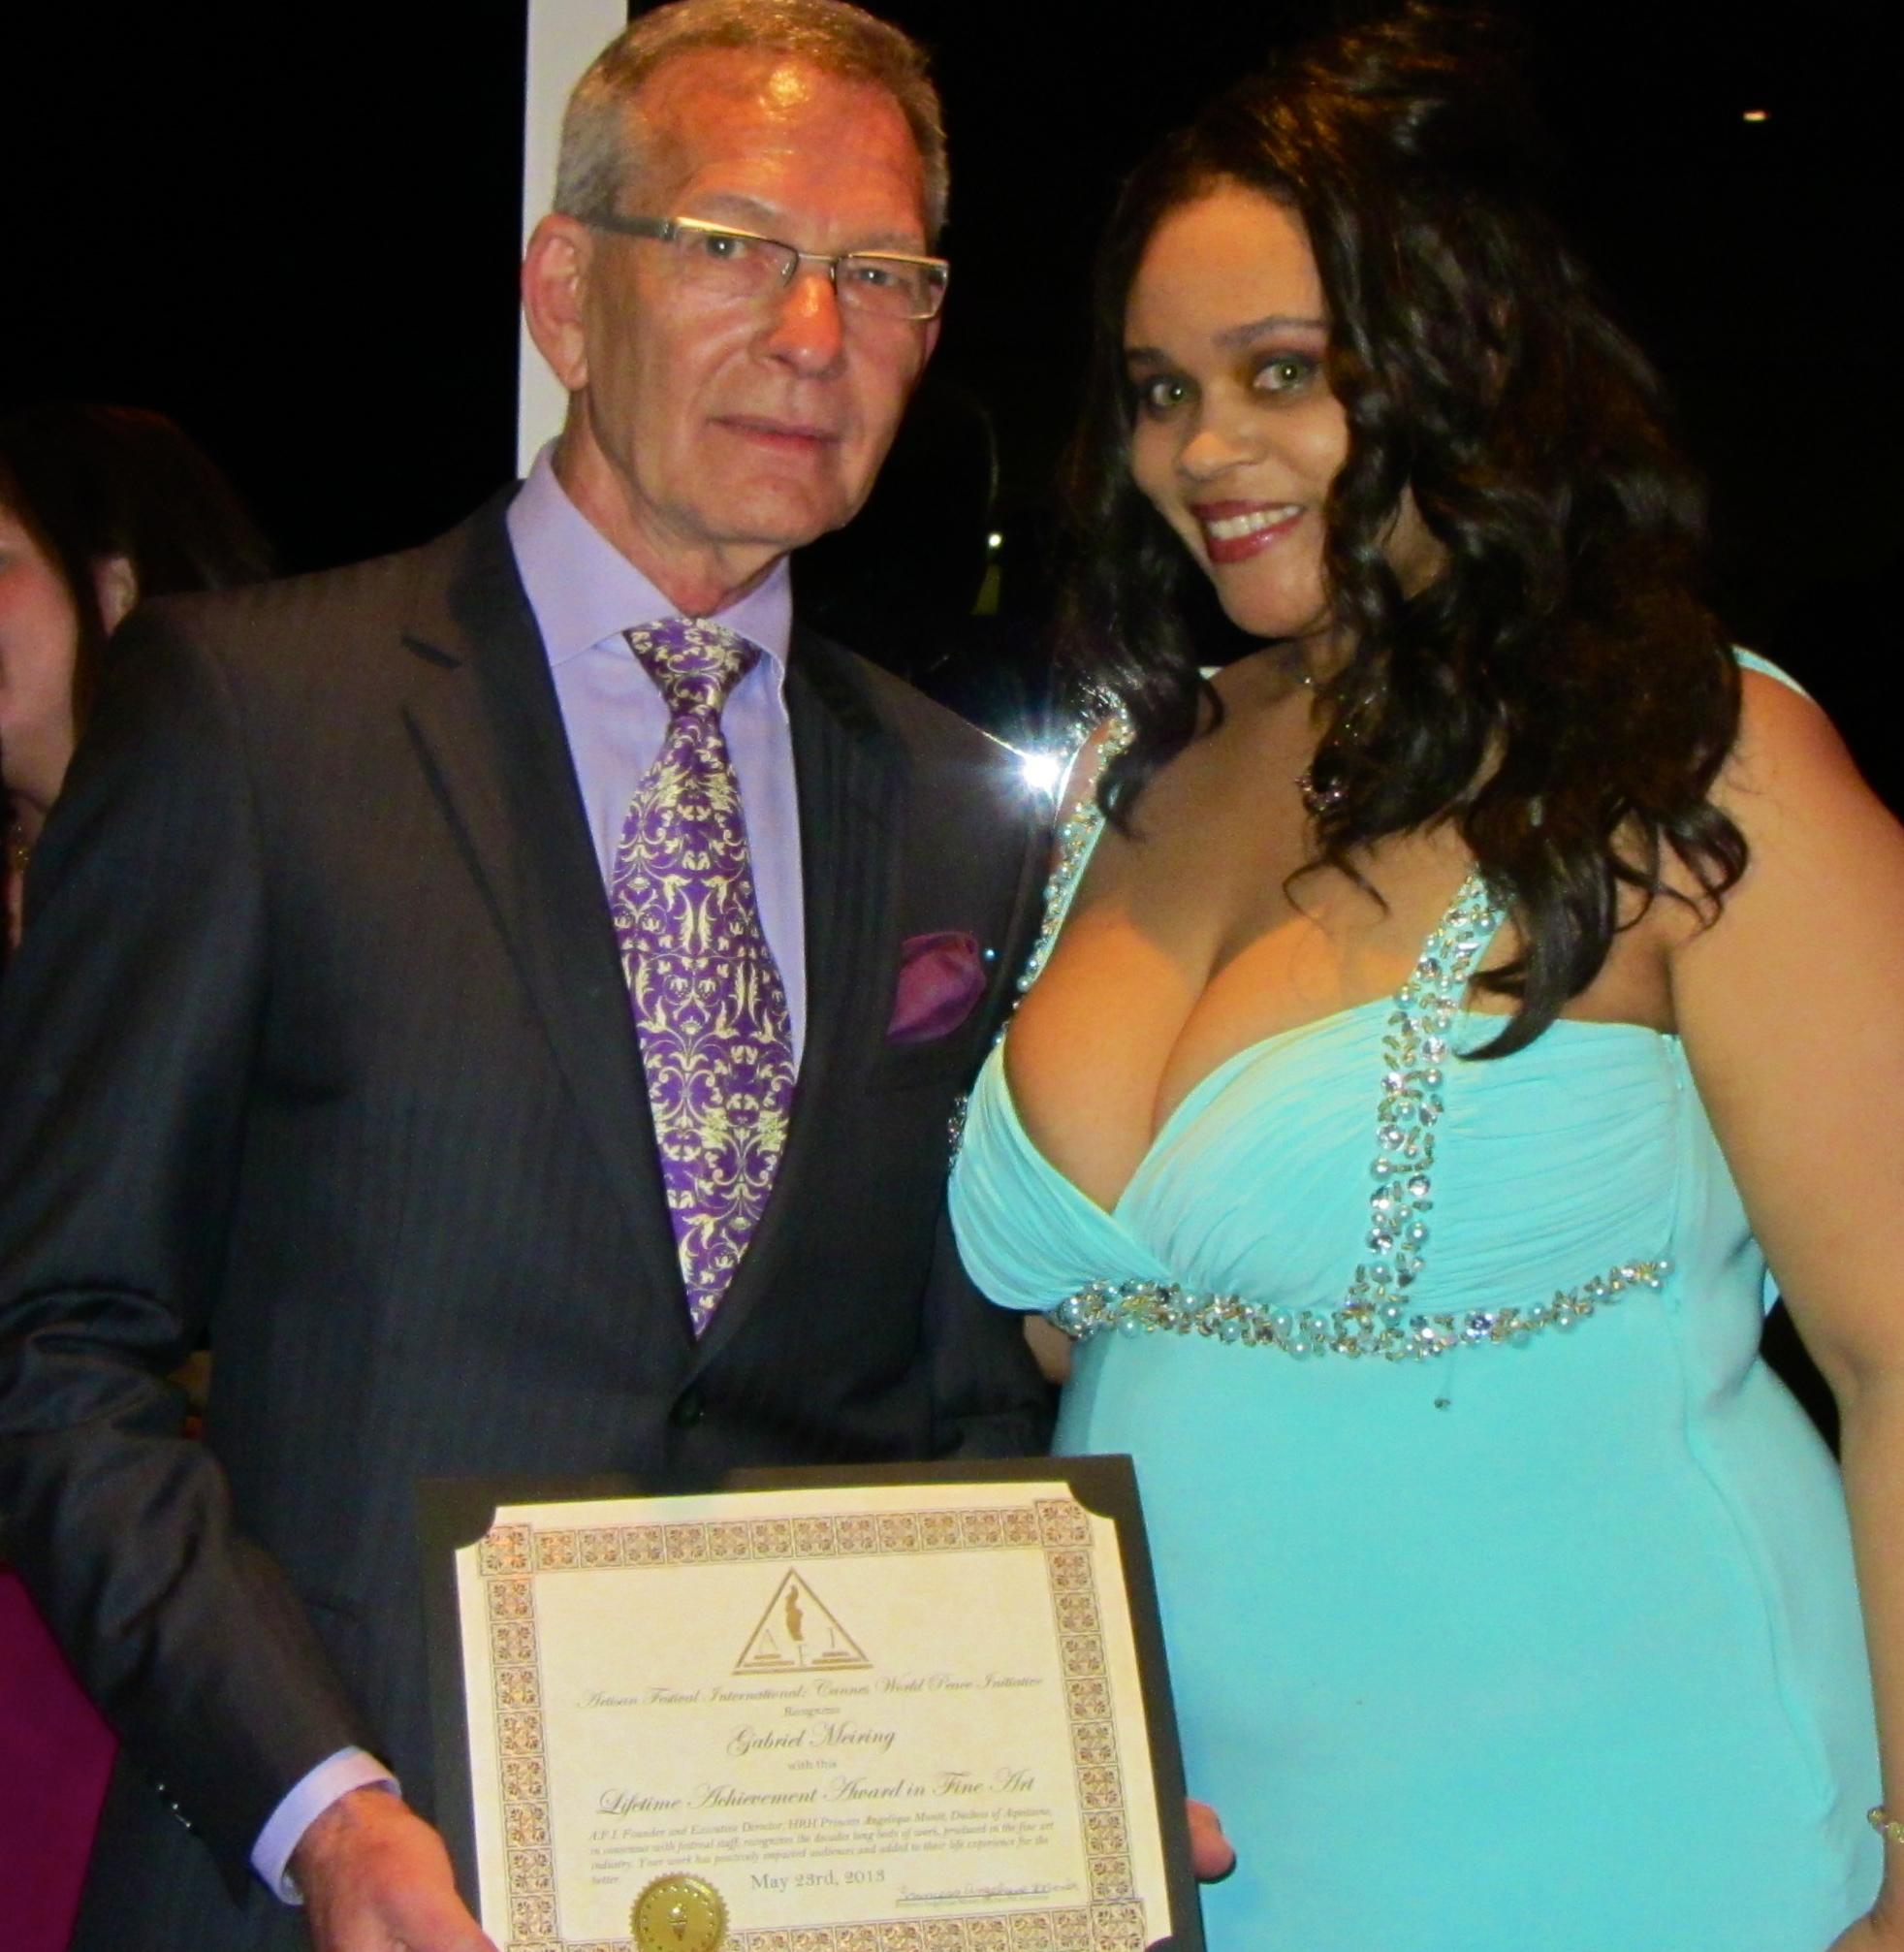 Gabriel Meiring             Lifetime Achievement Award in Art